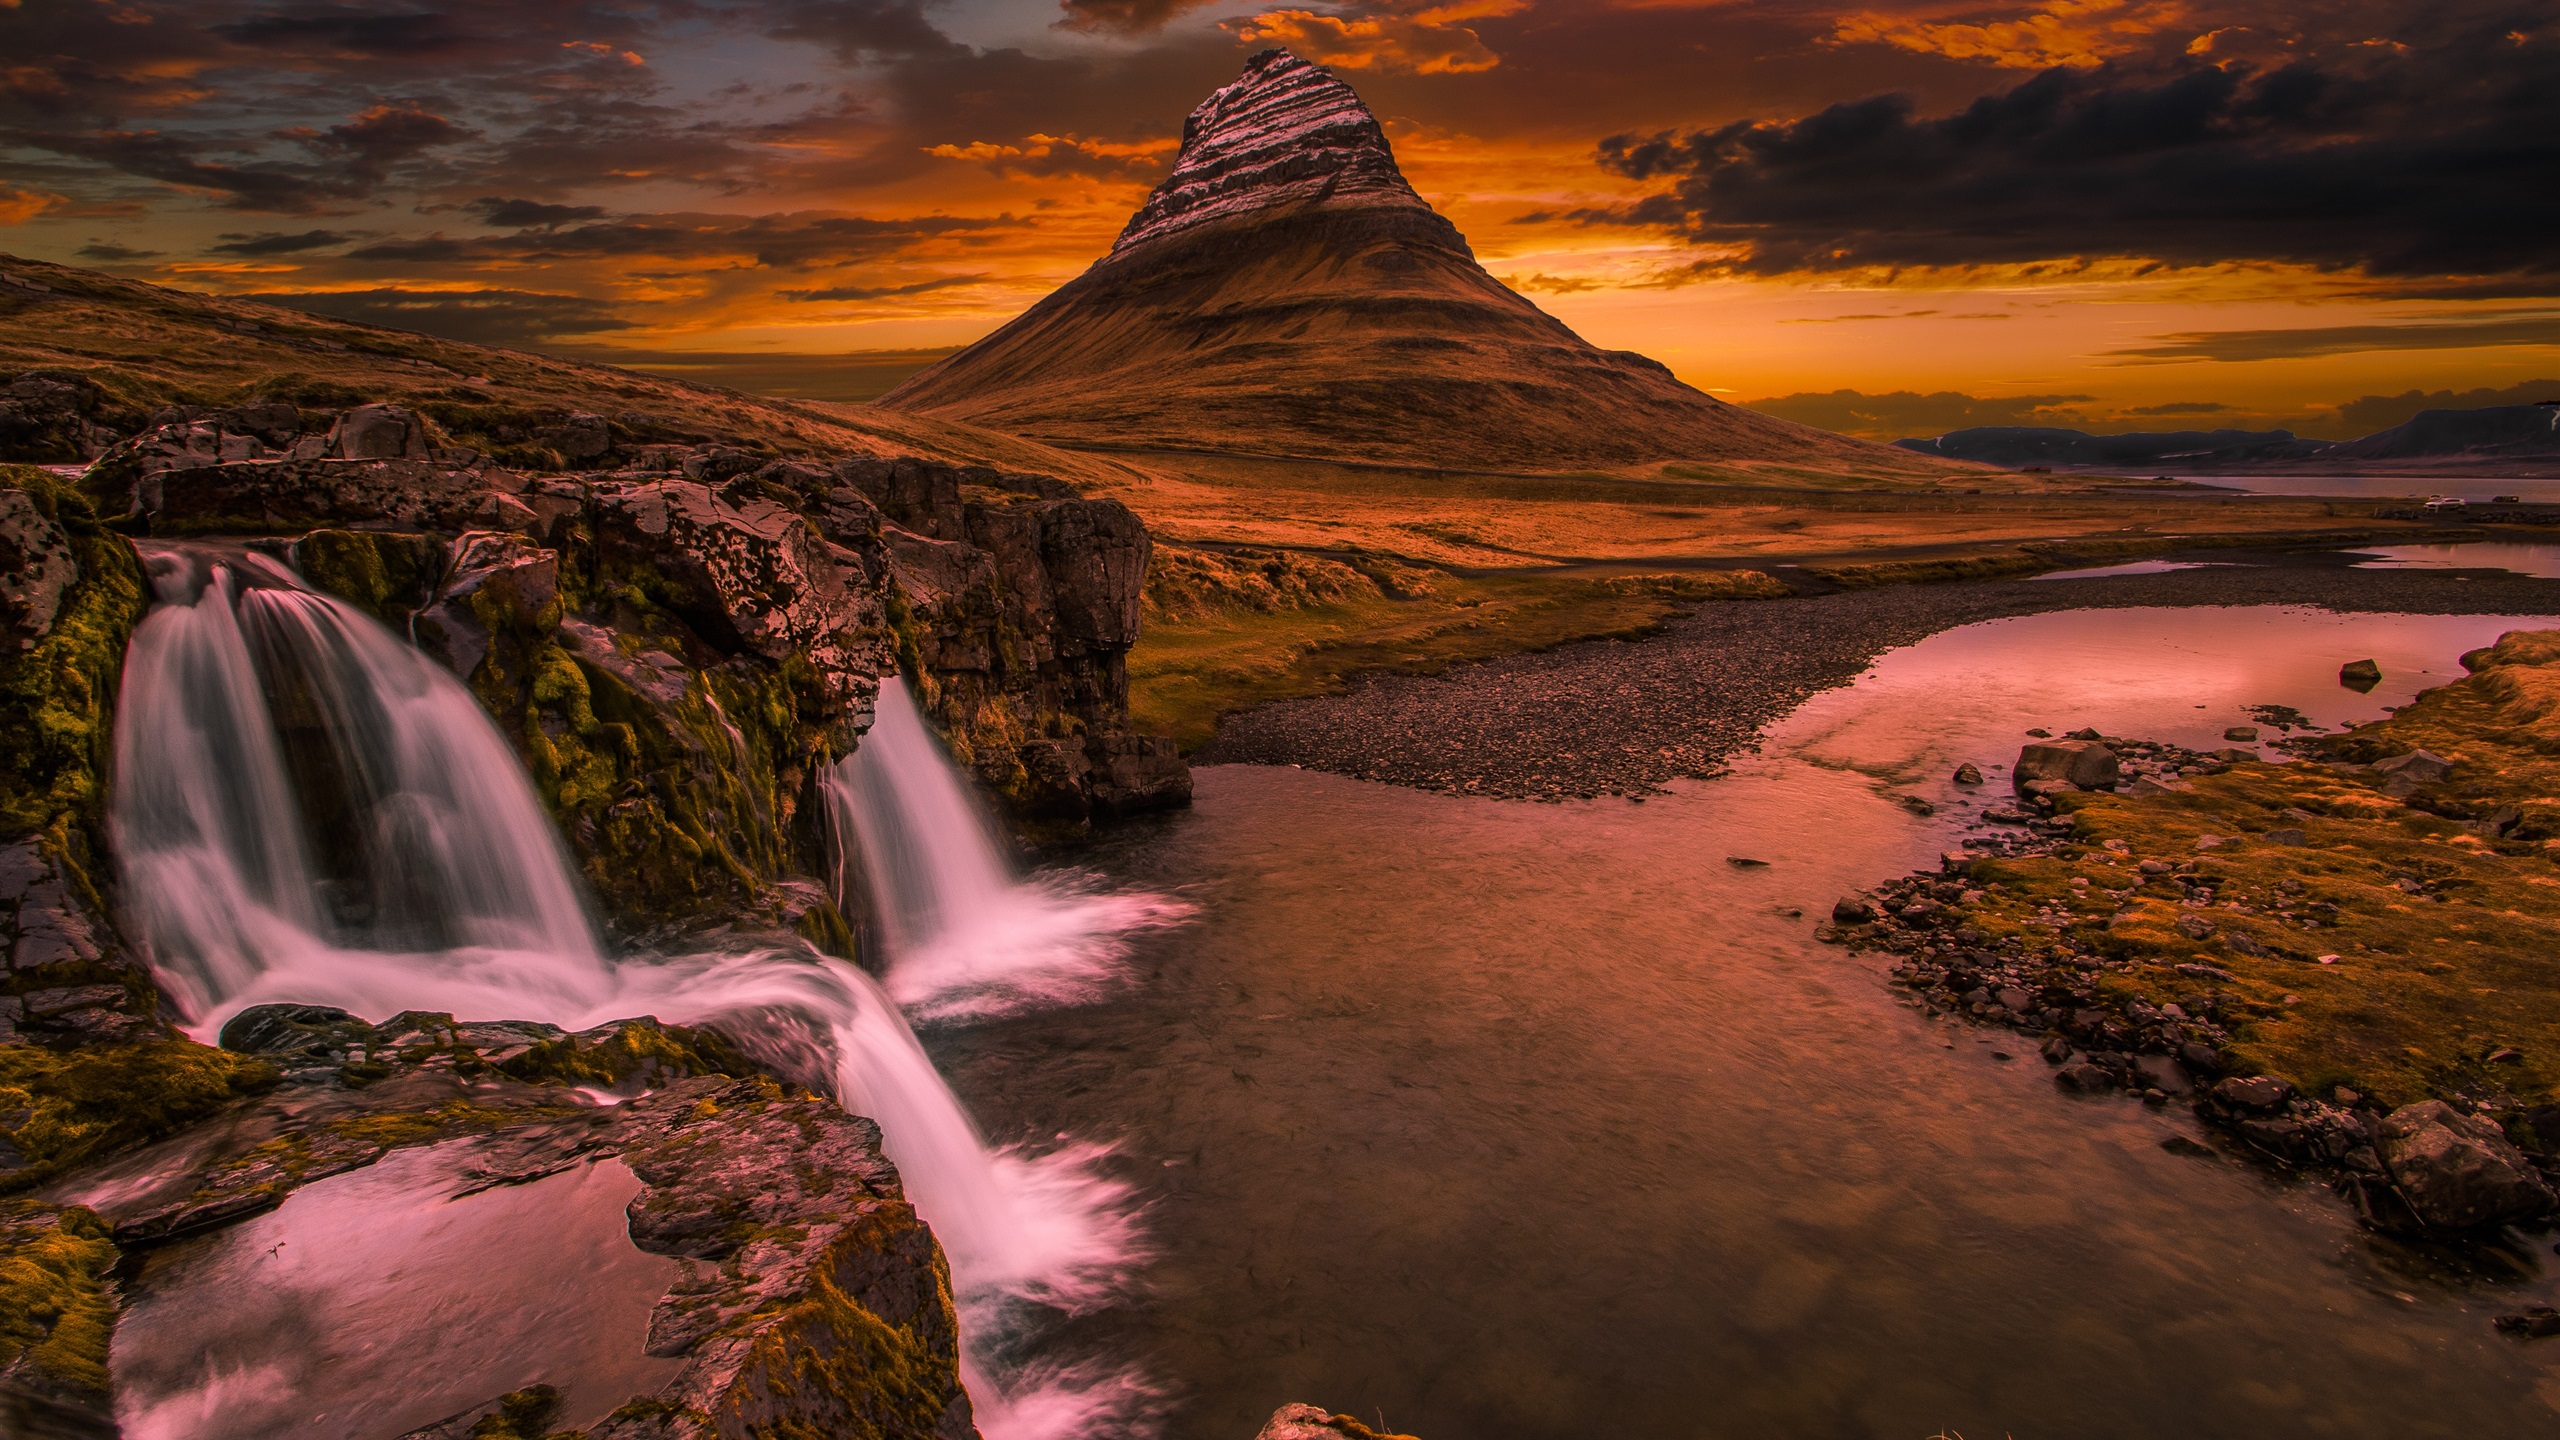 Wallpaper Kirkjufell Iceland Waterfall Mountain Clouds Sunset 3840x2160 Uhd 4k Picture Image